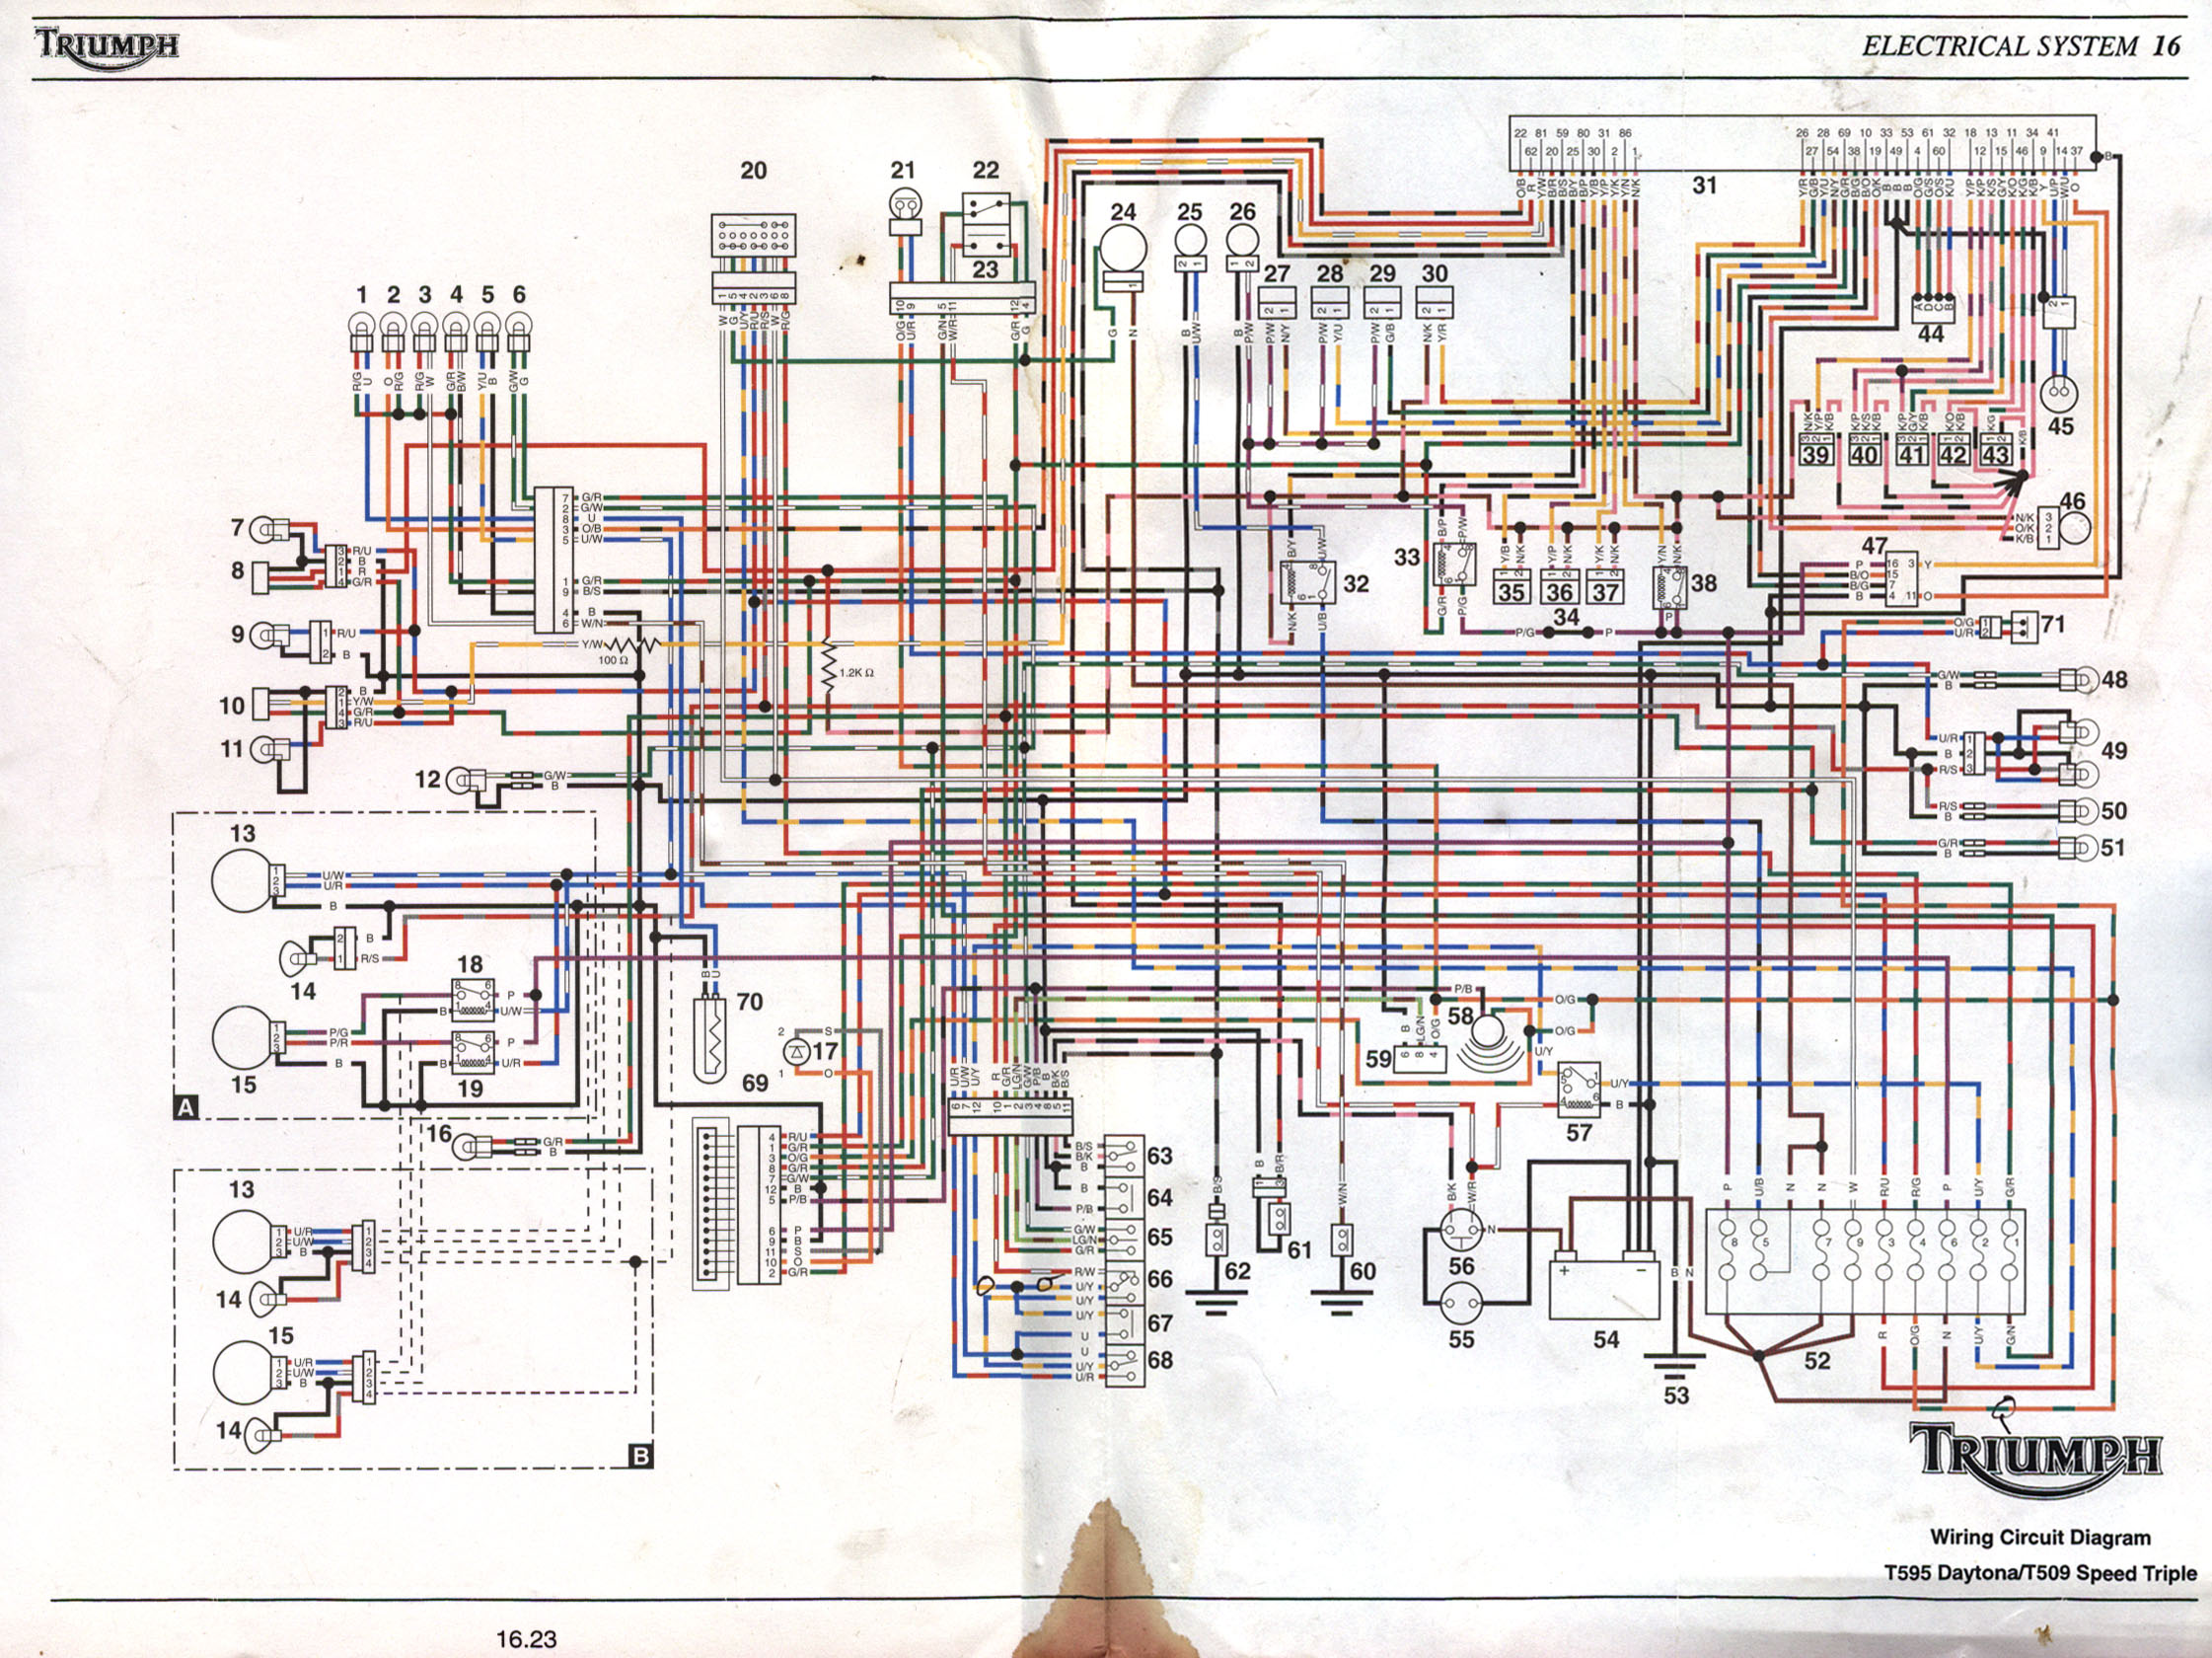 Rc51 Wiring Diagram Pdf